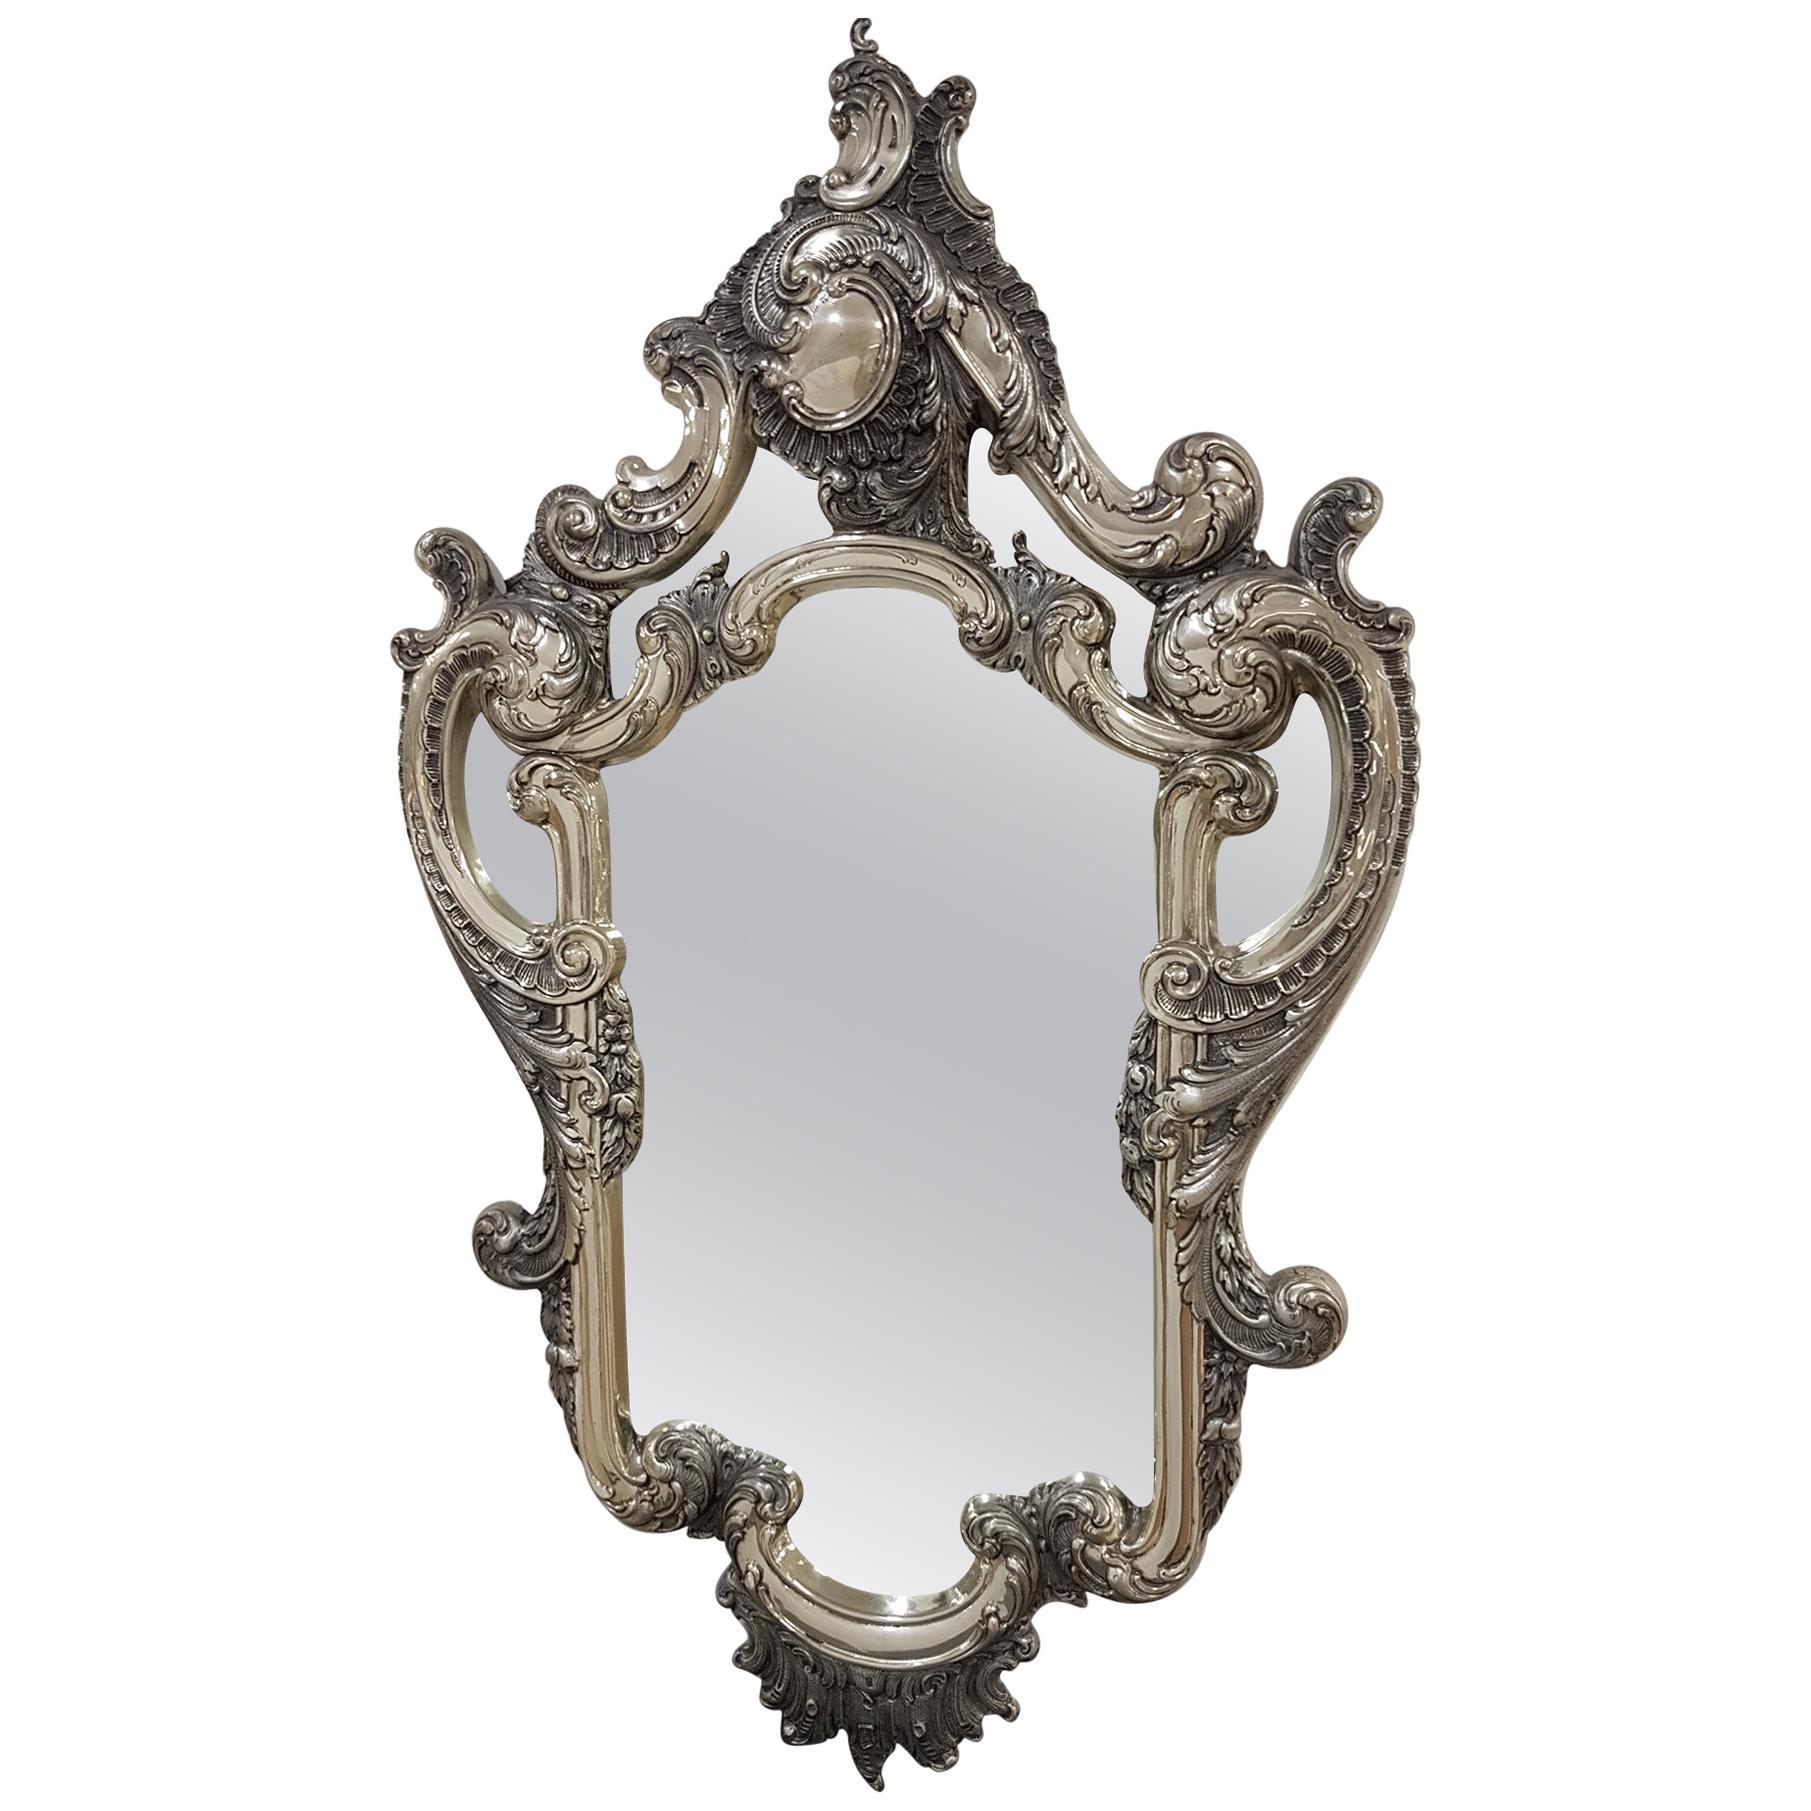 20th Century Italian Silver Barocco Wall Mirror